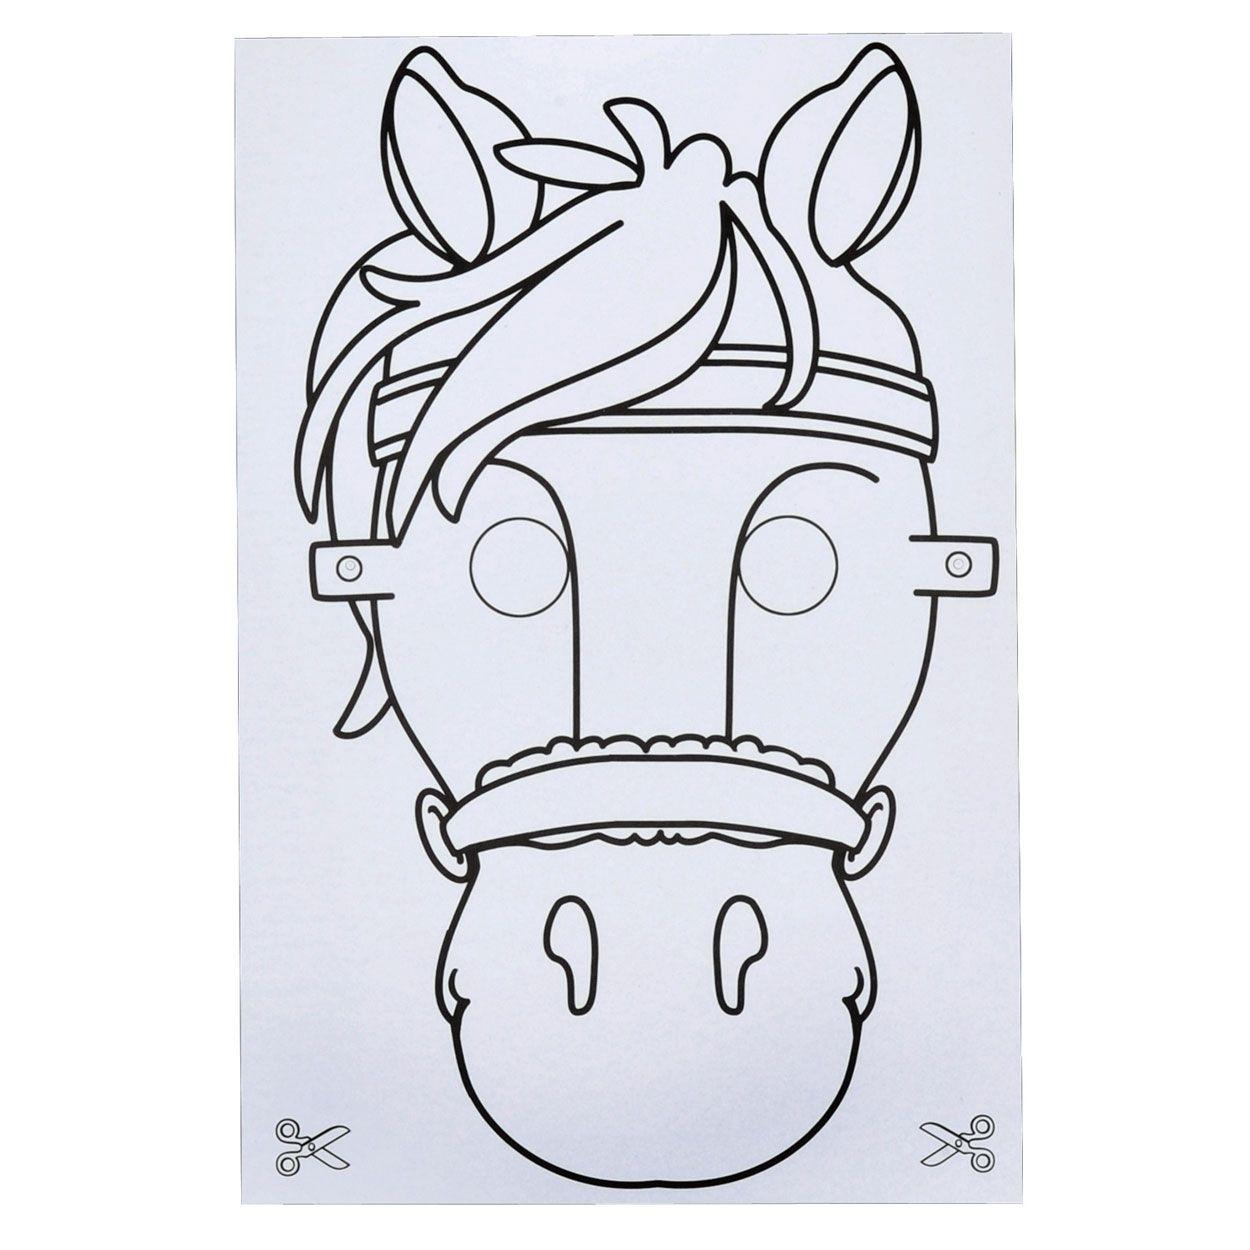 Kleurplaten Maskers Maken.Sint Maskers Maken Knutselen Sinterklaas Maskers En